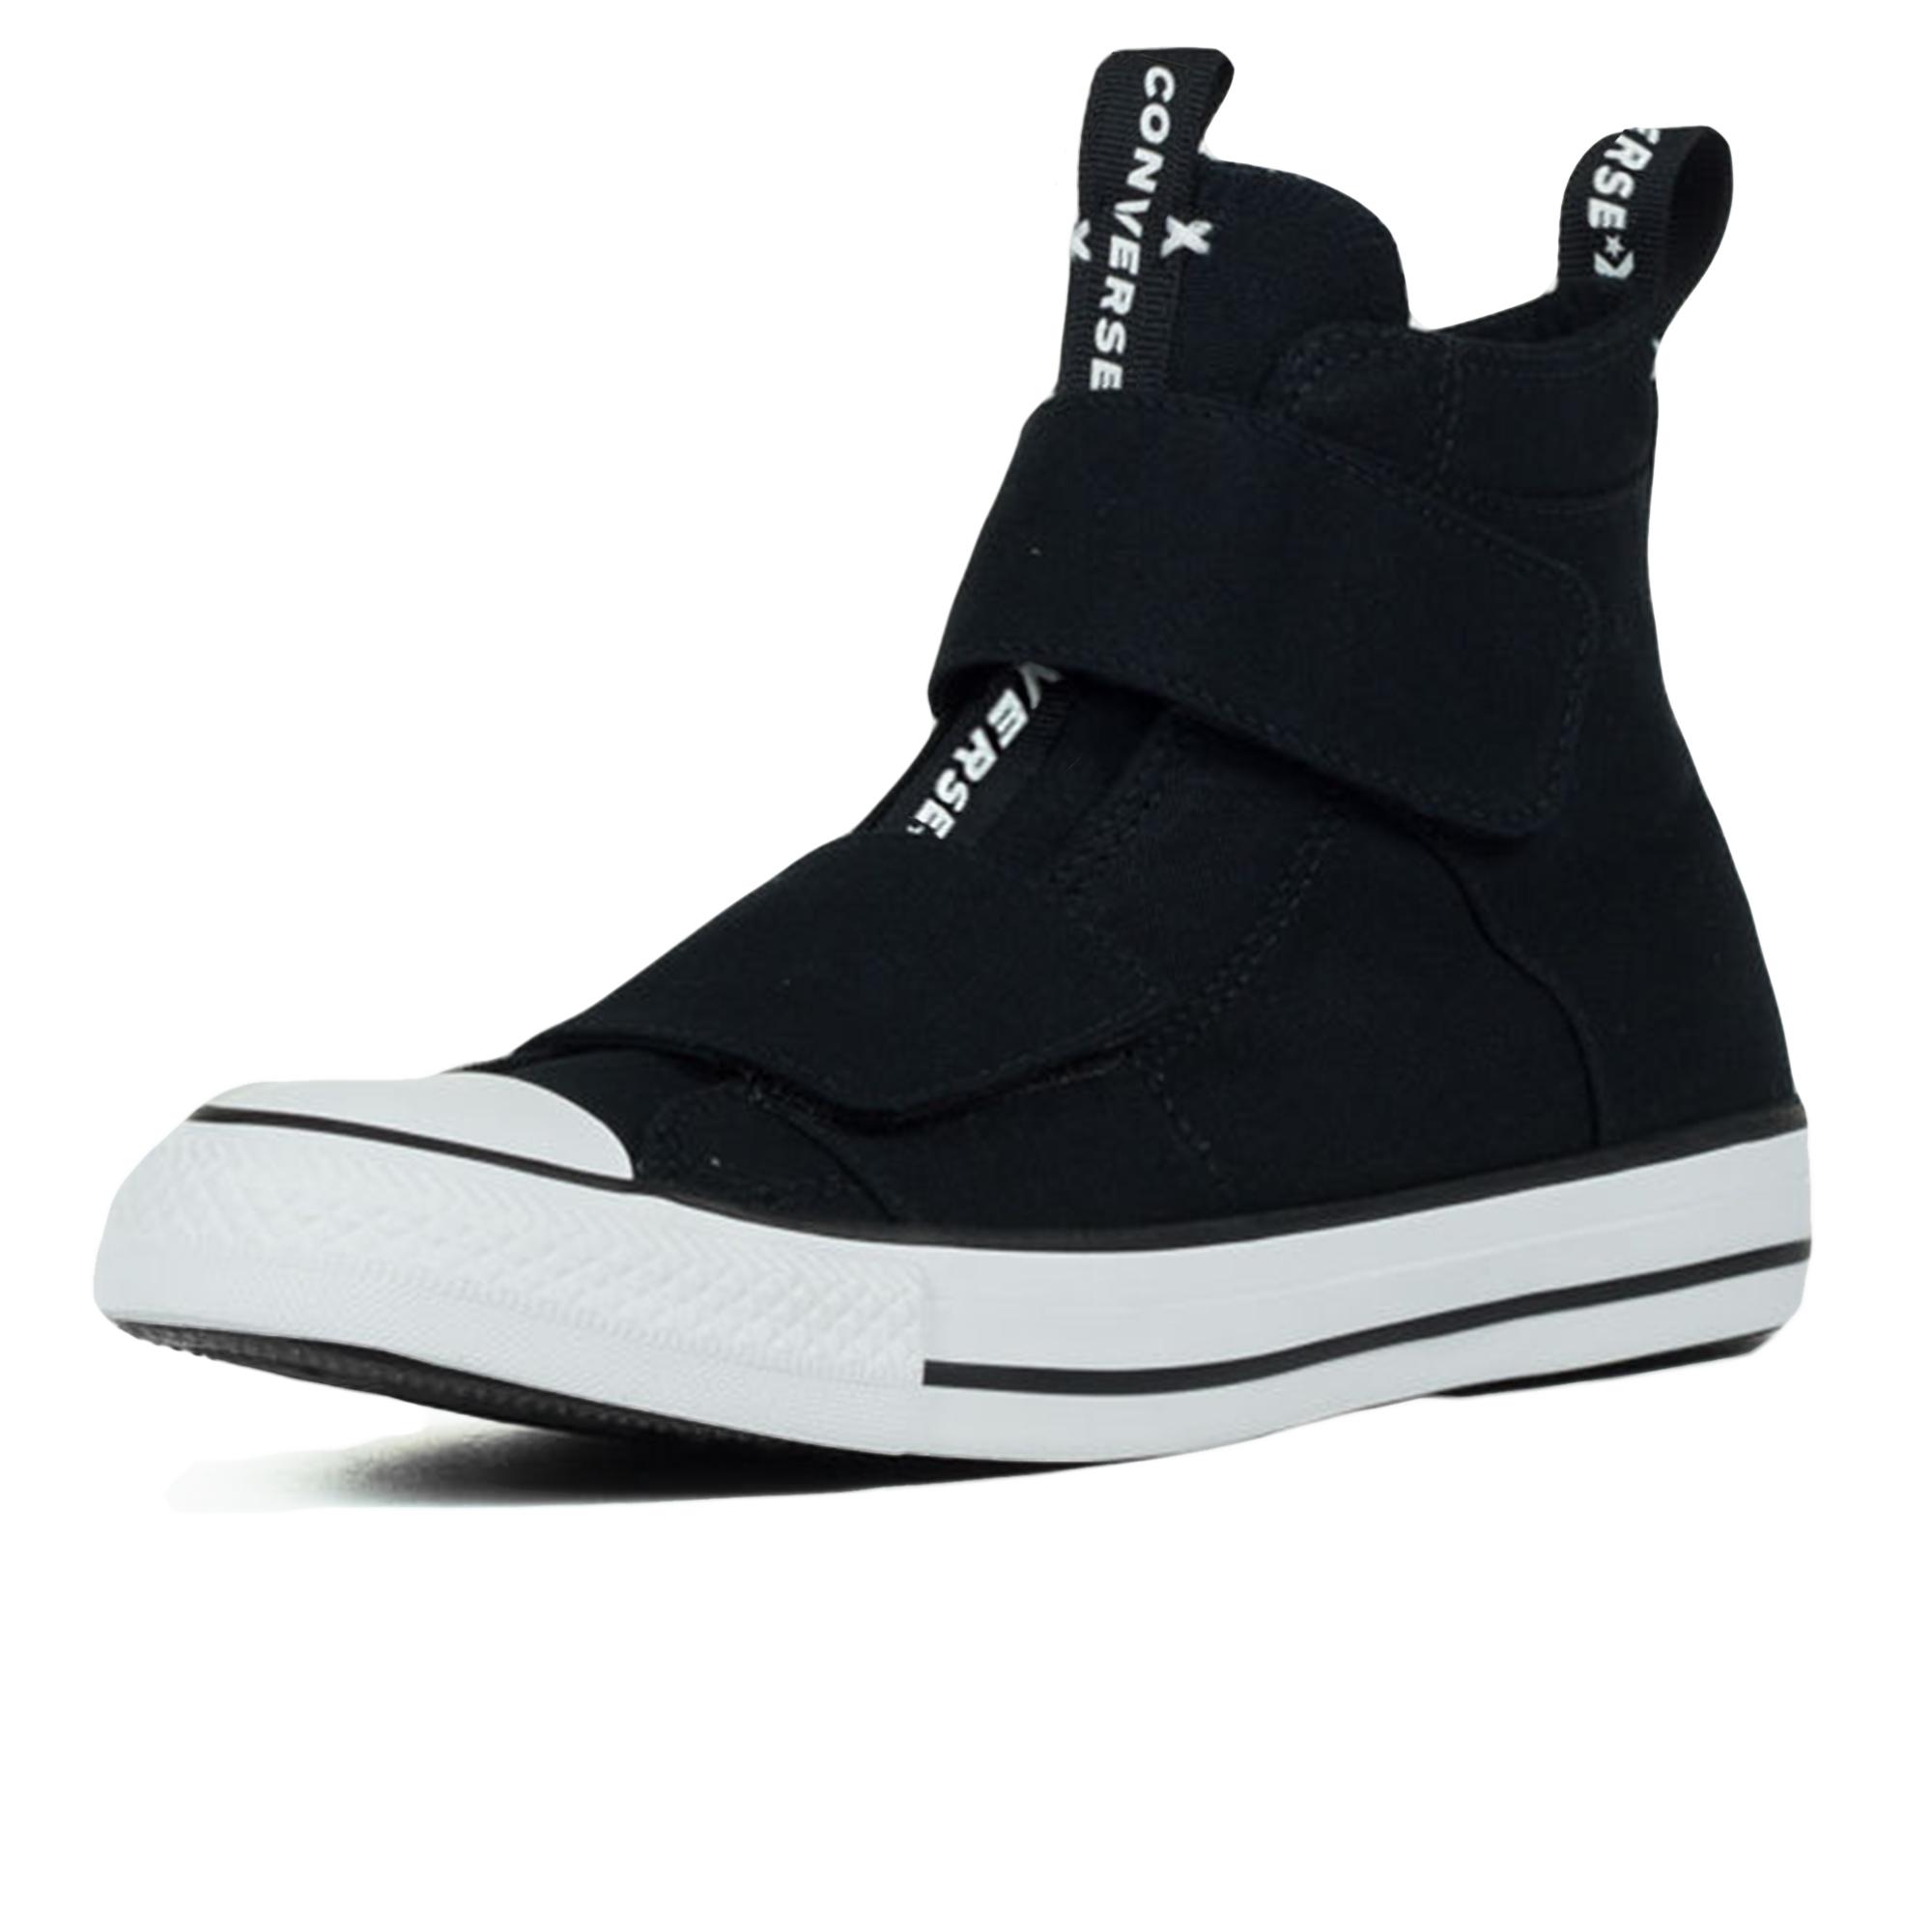 Converse 164546C Scarpe Sneakers